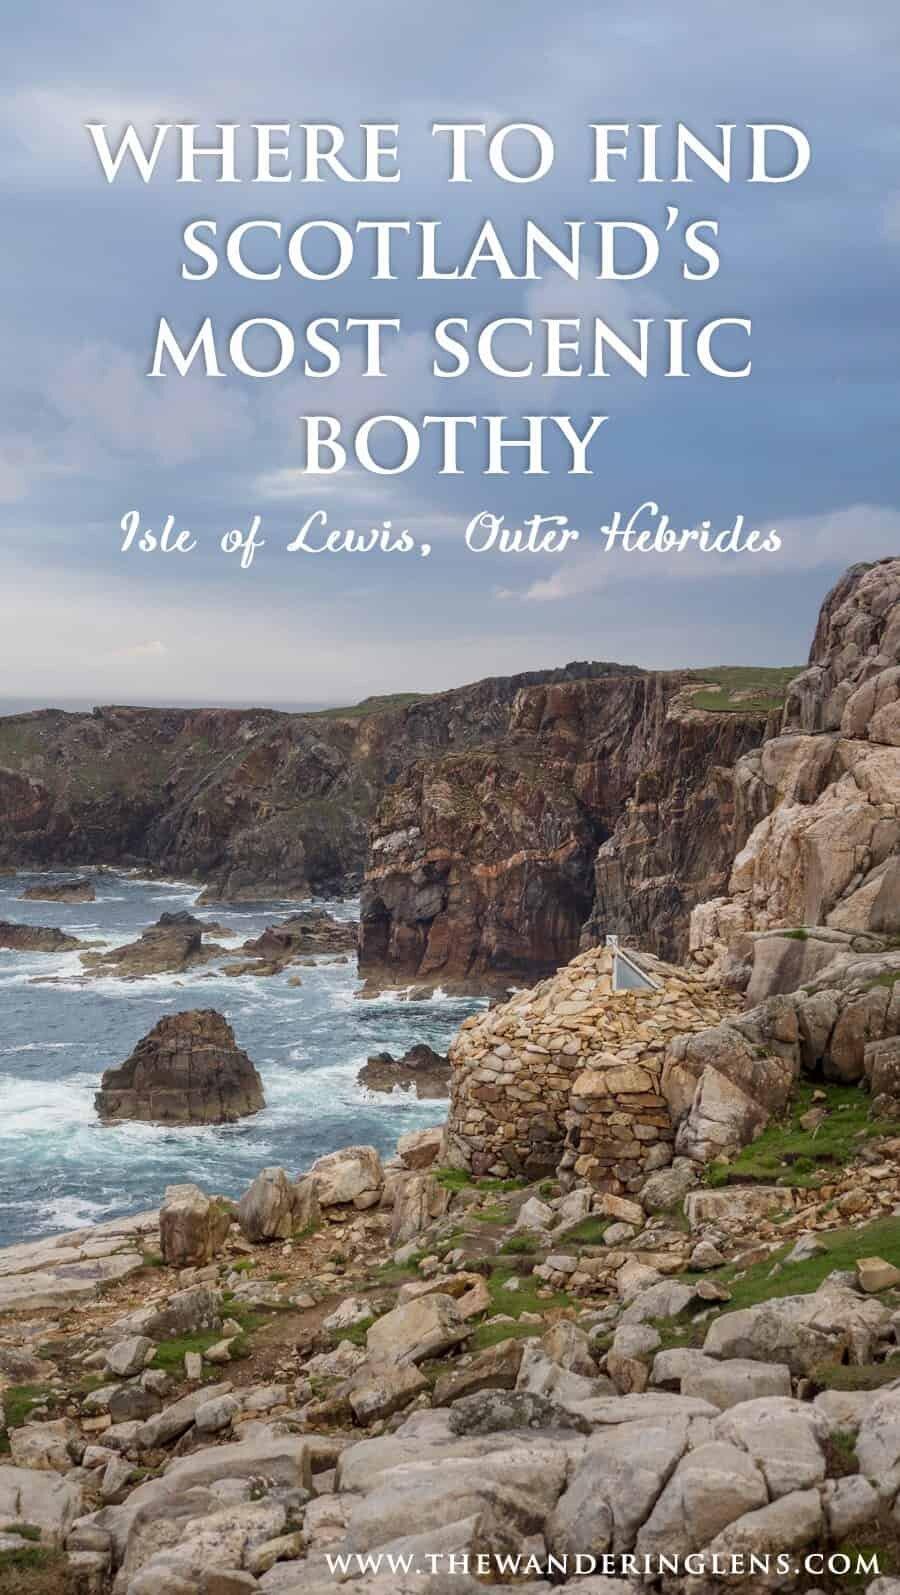 Mangersta Bothy, Uig Isle of Lewis, Outer Hebrides, Scotland